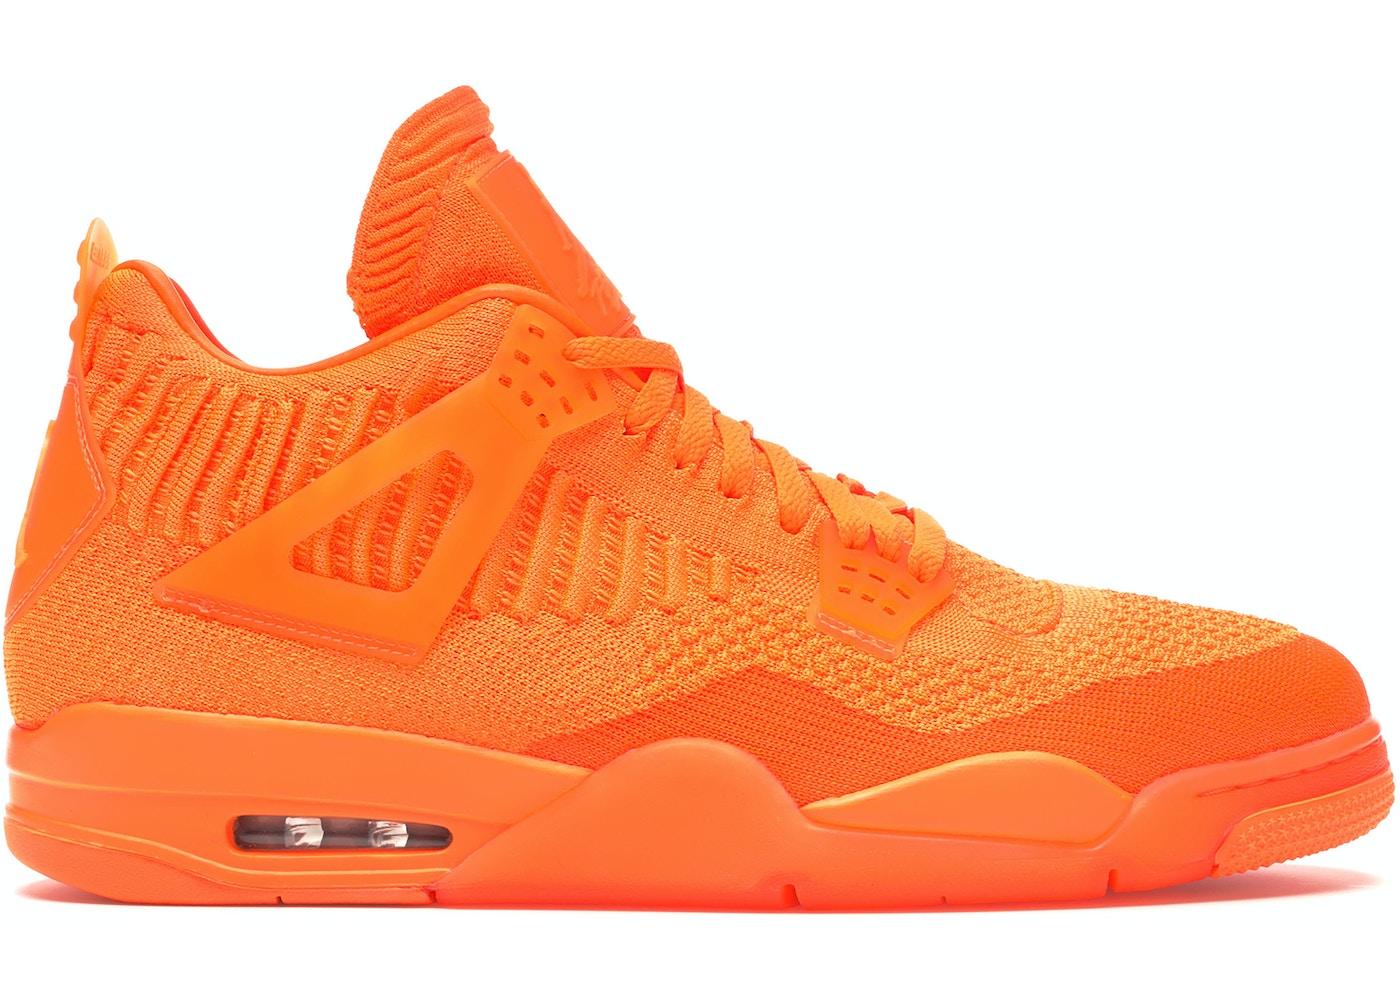 new product 1db0b 0008d Jordan 4 Retro Flyknit Orange